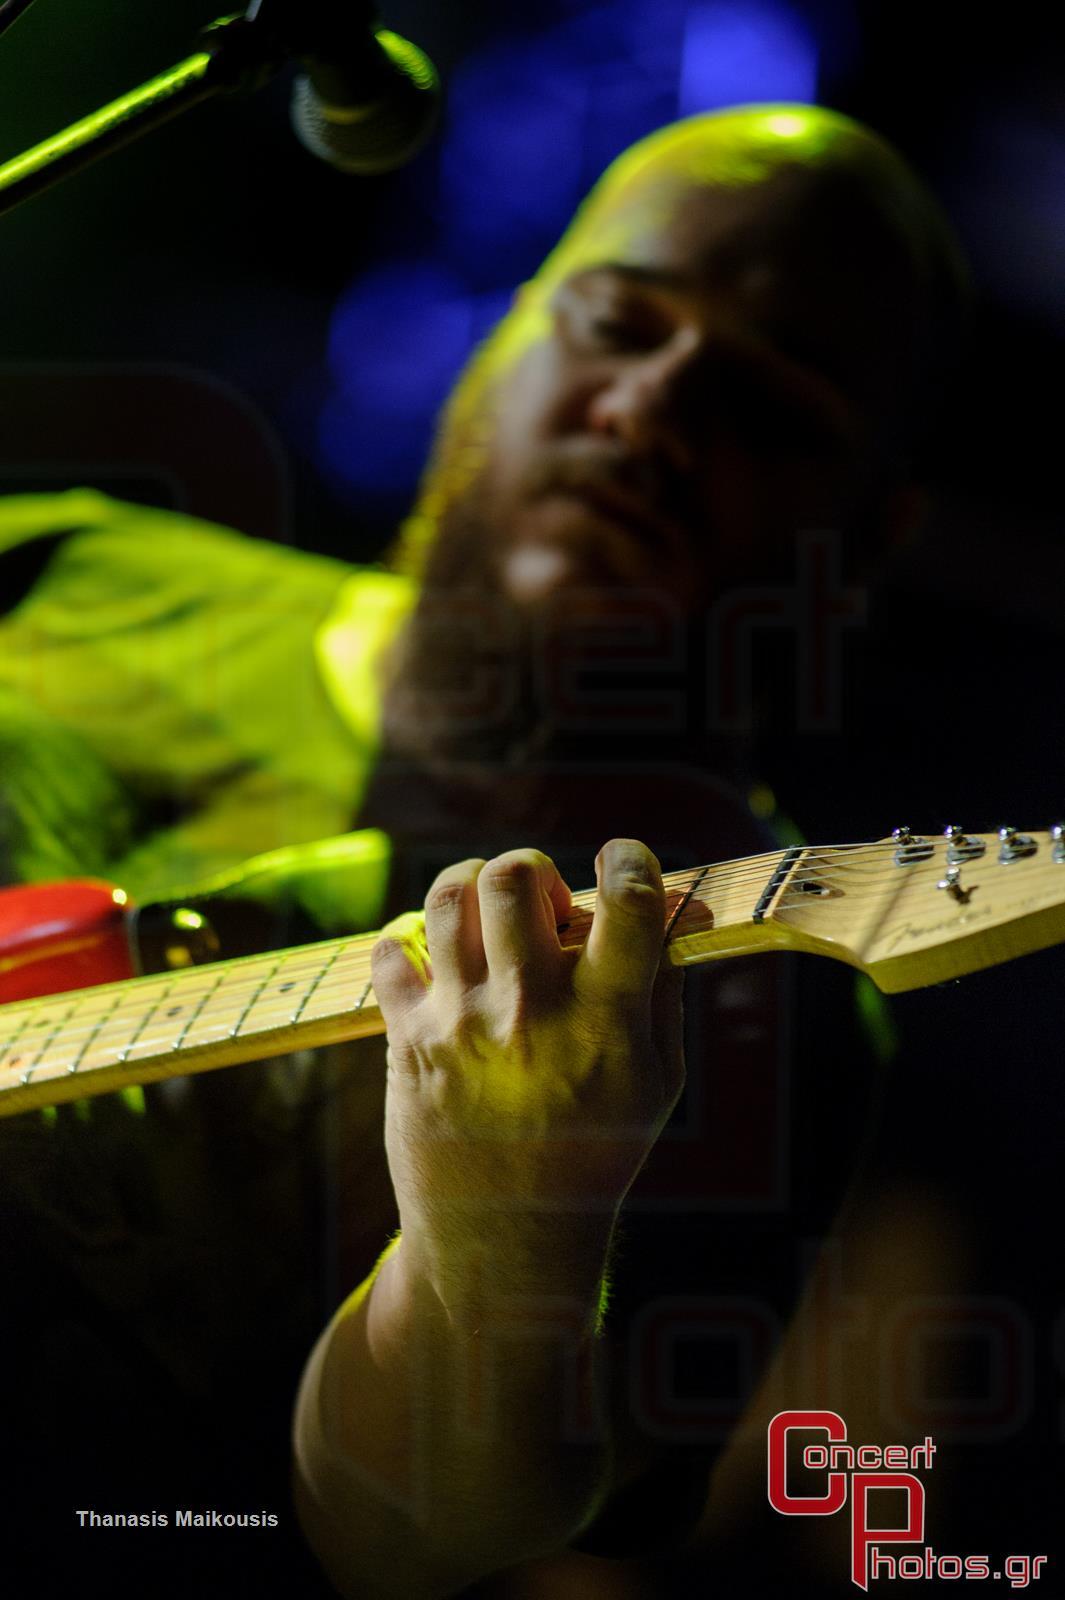 Active Member - Τραγούδα μας να φύγει το σκοτάδι- photographer: Thanasis Maikousis - concertphotos_-5575